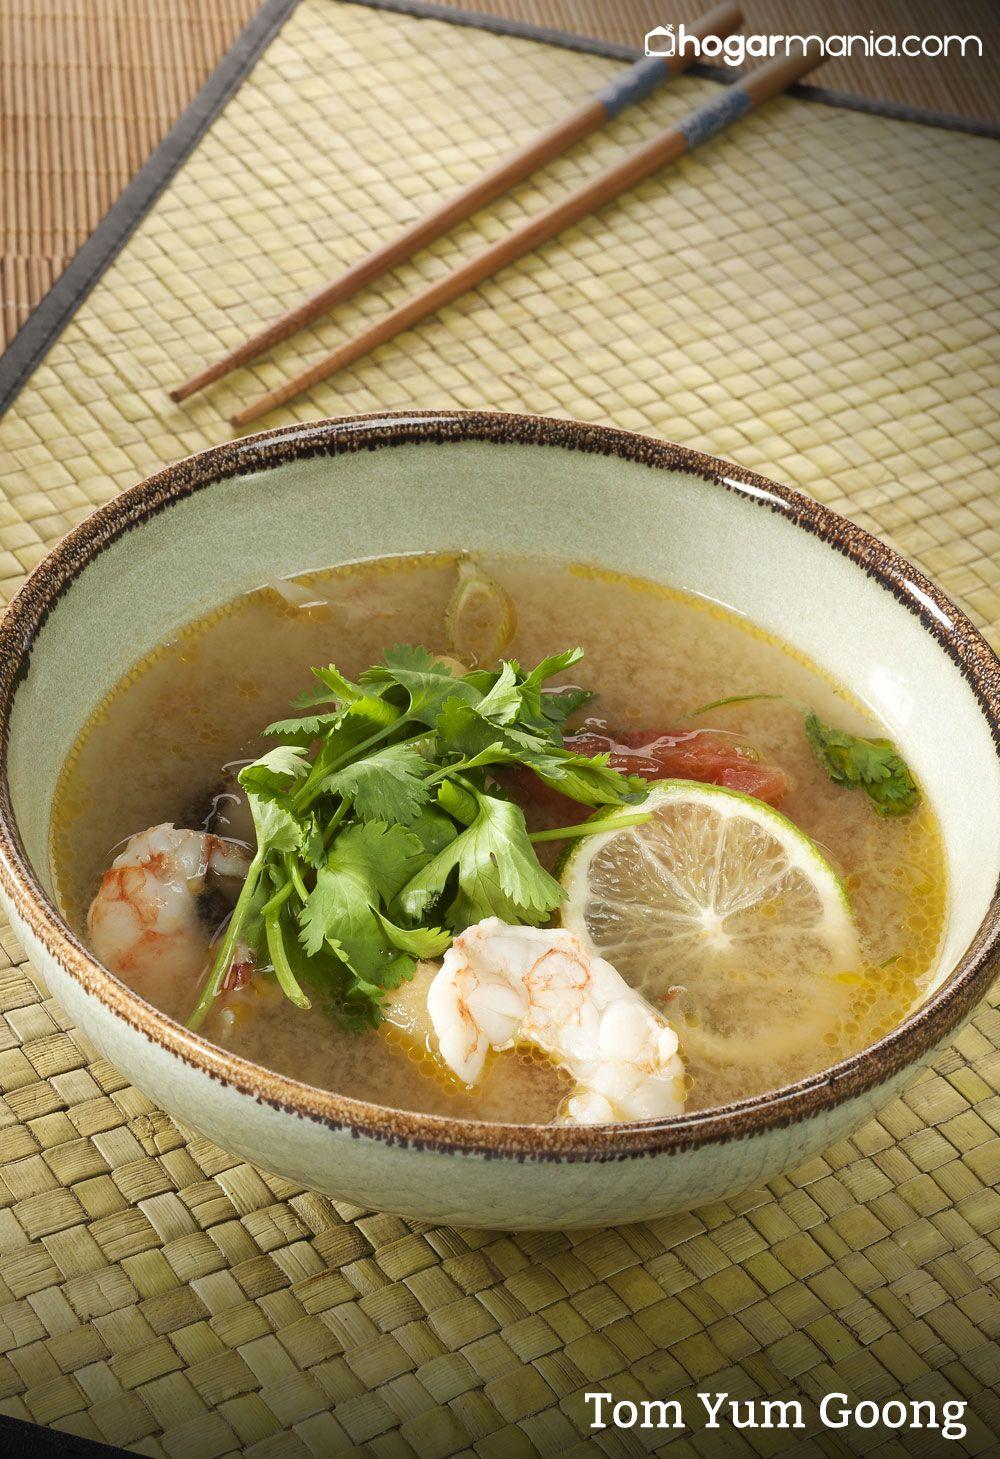 Tom yum goong, sopa con gambas tailandesa